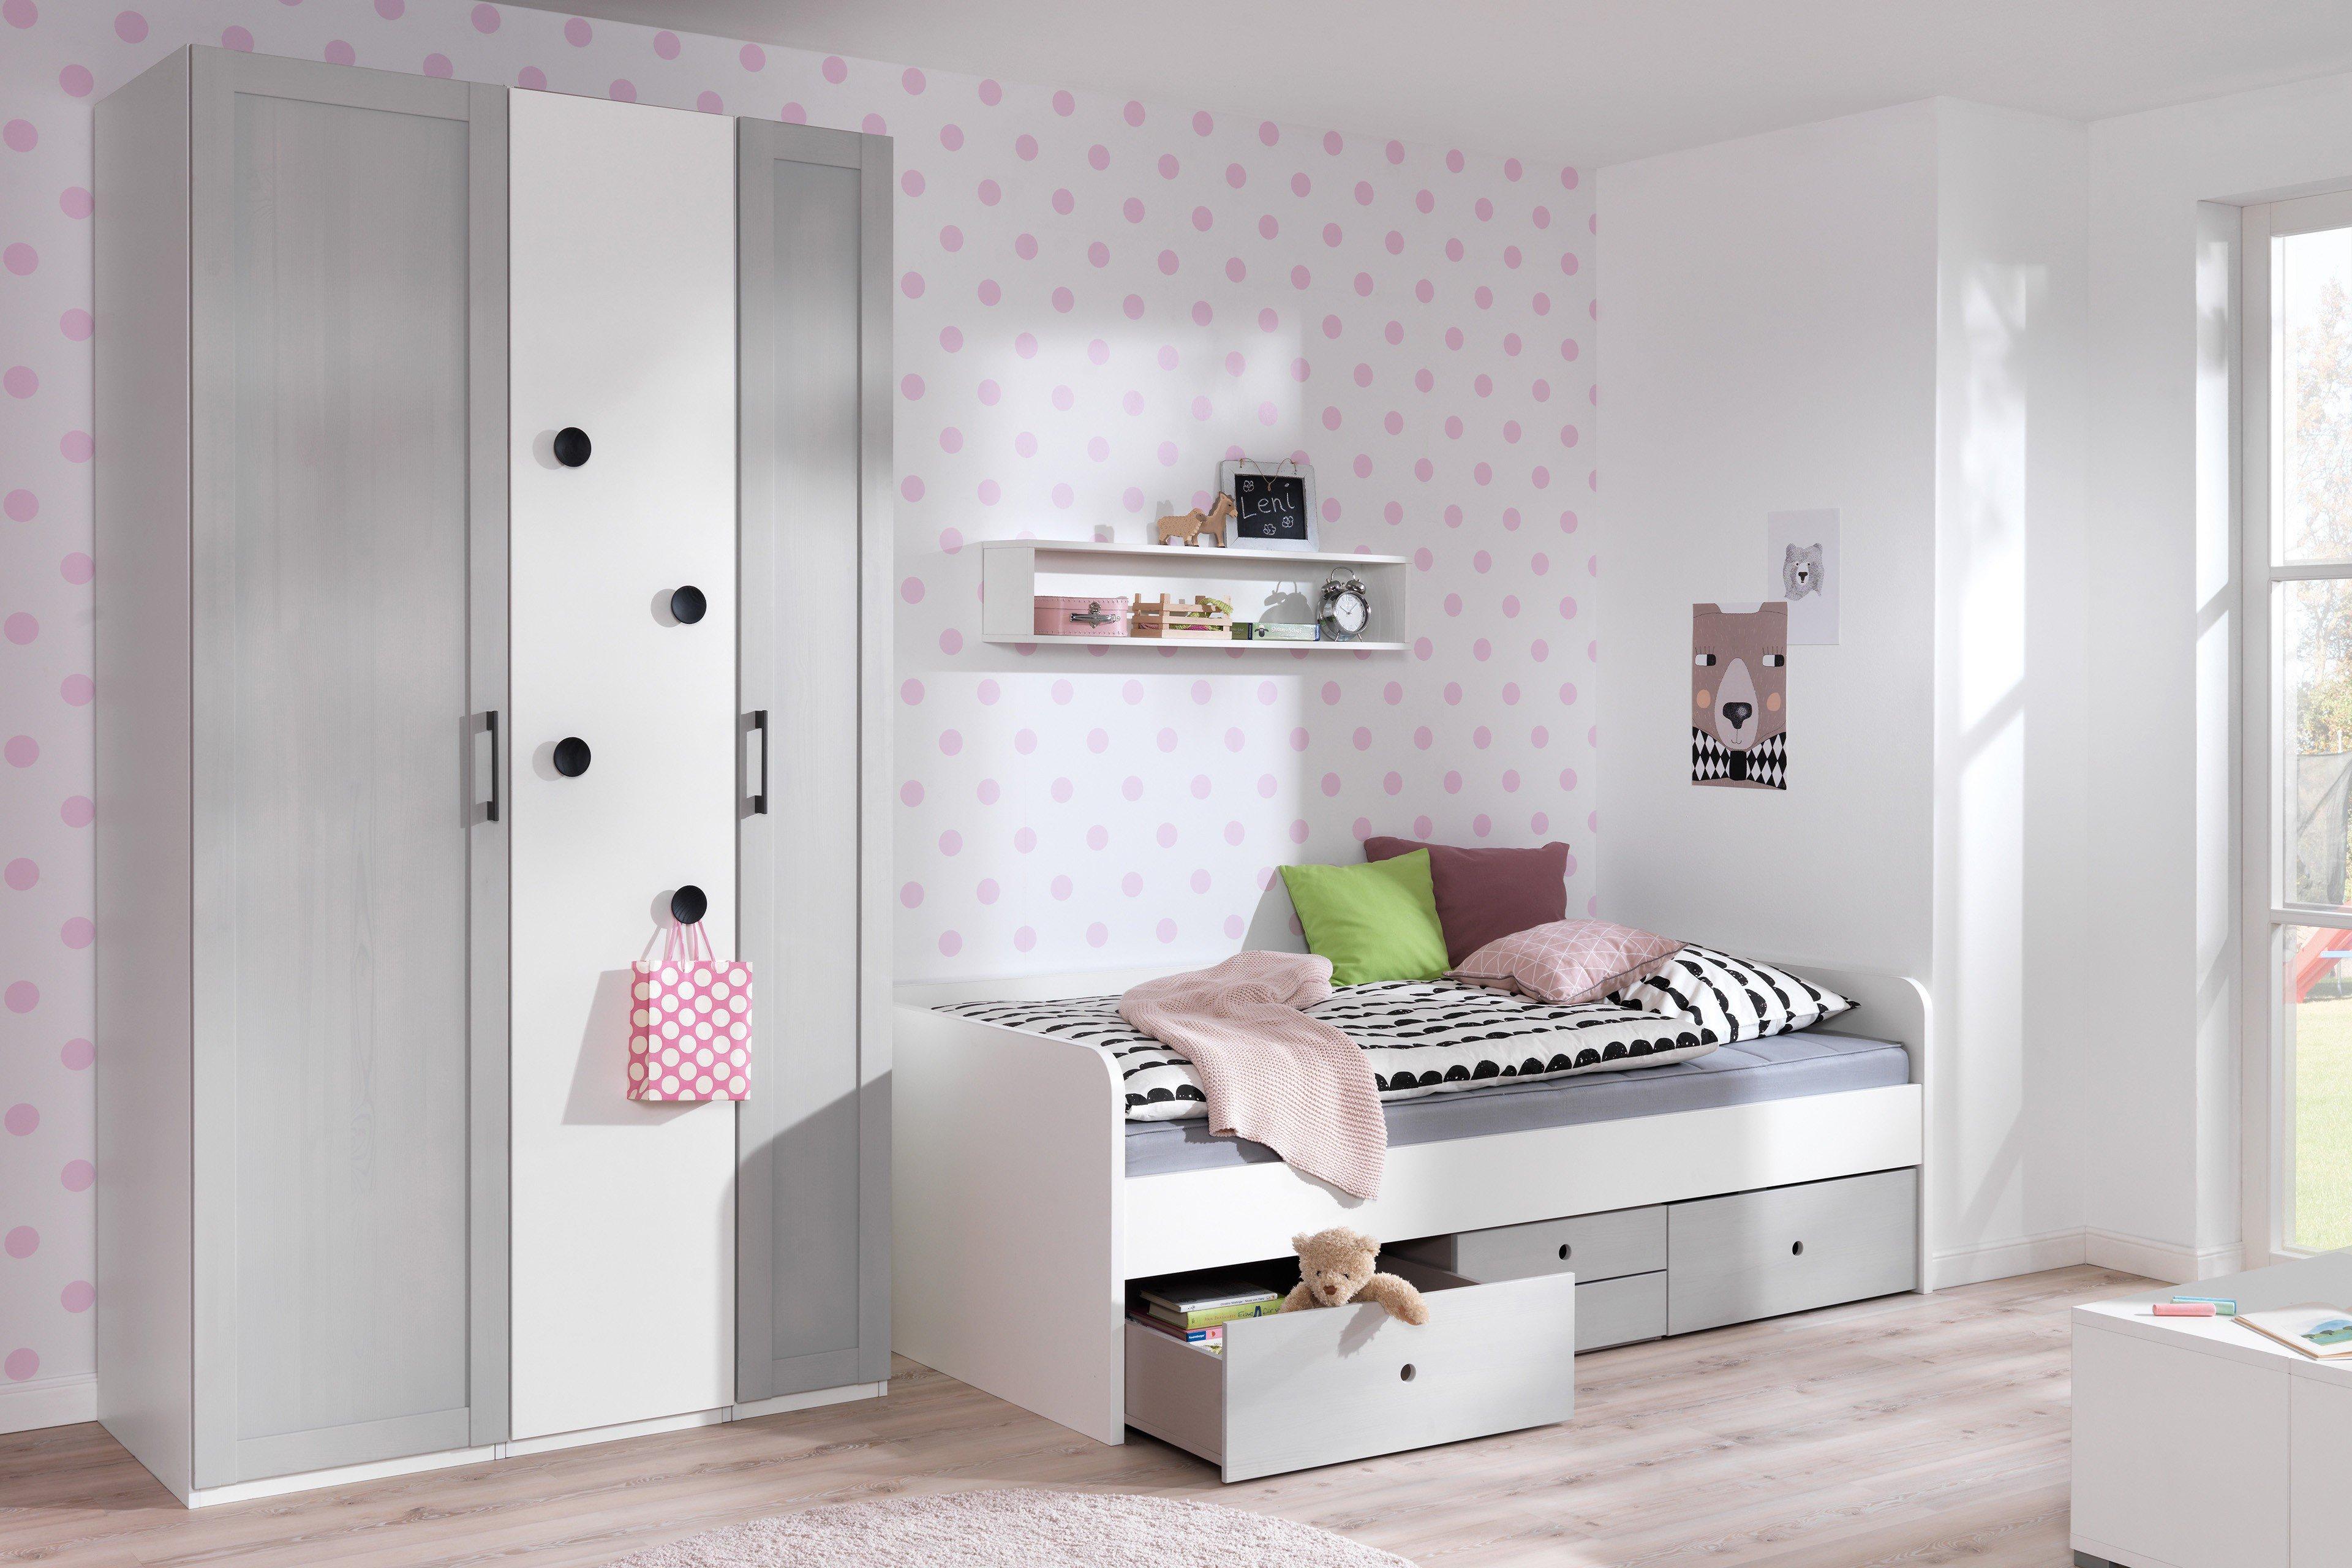 Attraktiv Kinder Jugendzimmer Beste Wahl New Concept Base Von Wellemöbel - Kinder-